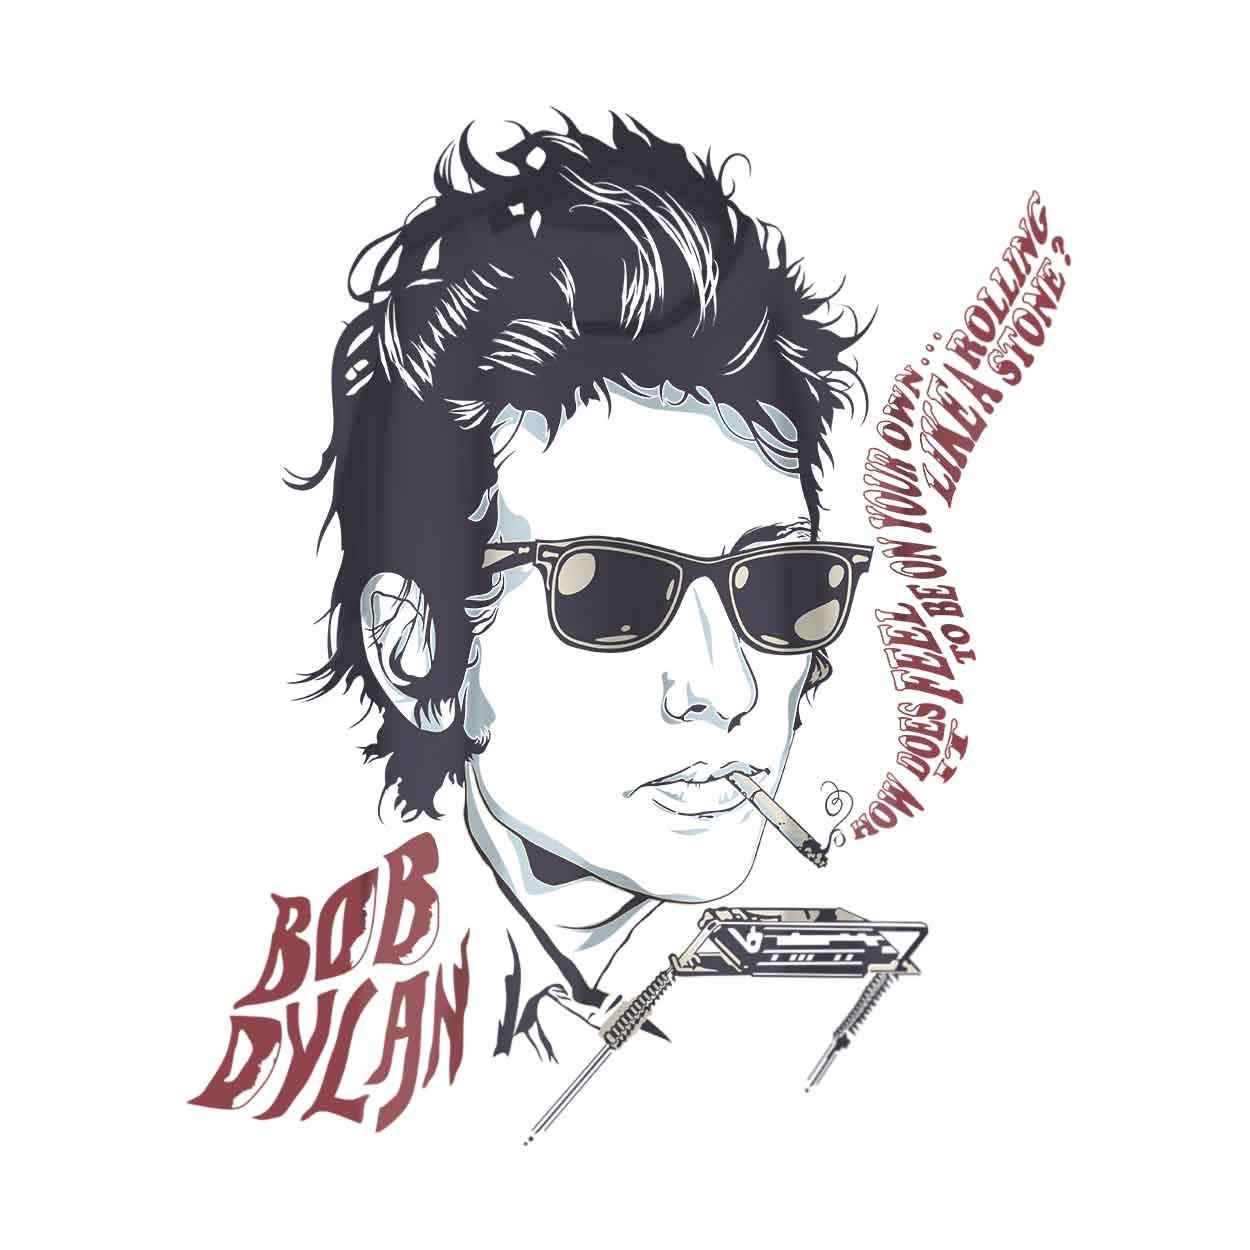 Camiseta Like a Rolling Stones 2 - Bob Dylan - Feminino